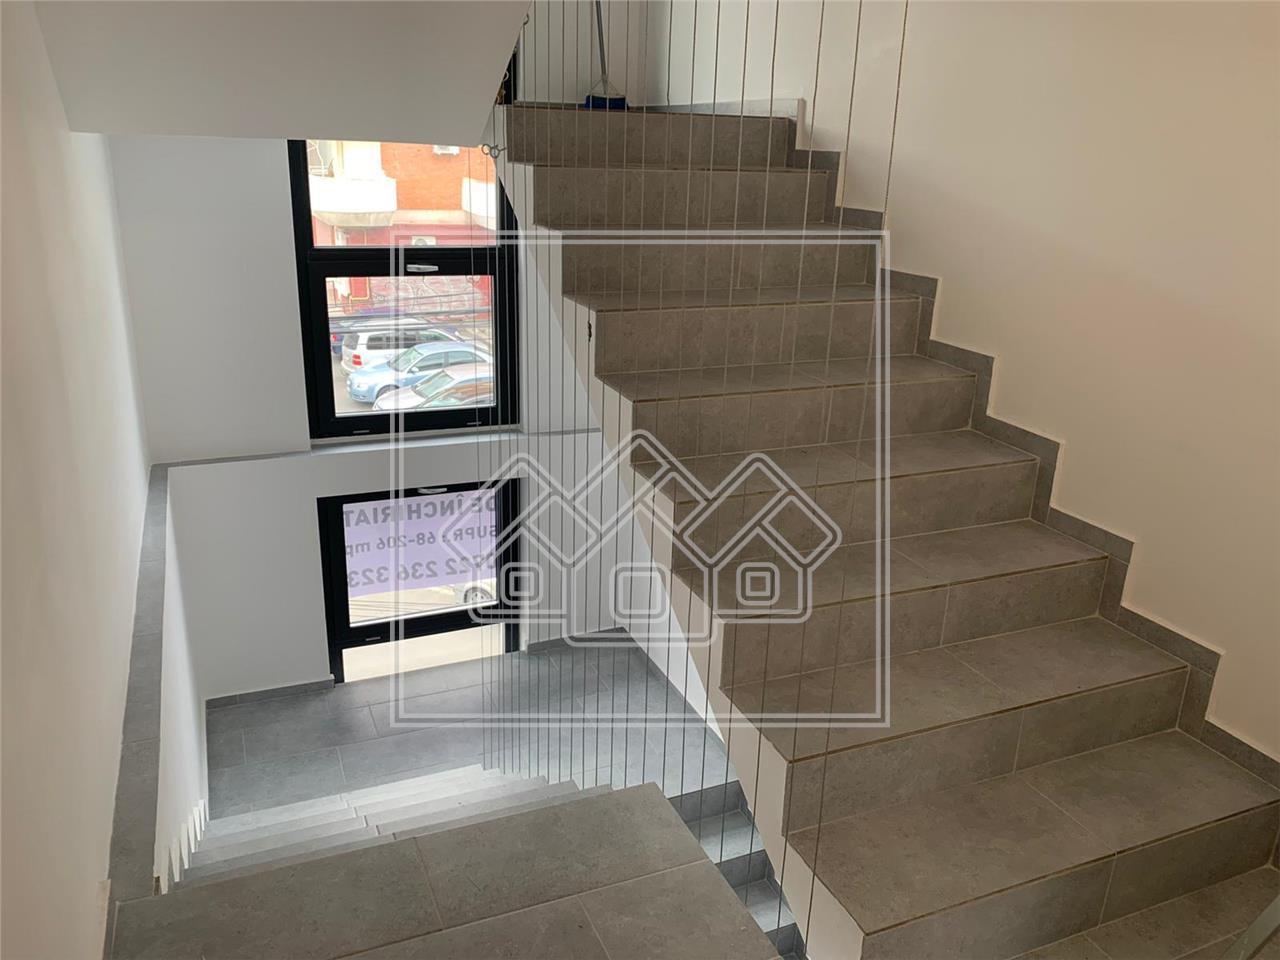 Spatiu de Birouri sau Apartament de Inchiriat in Sibiu- Strada Rennes